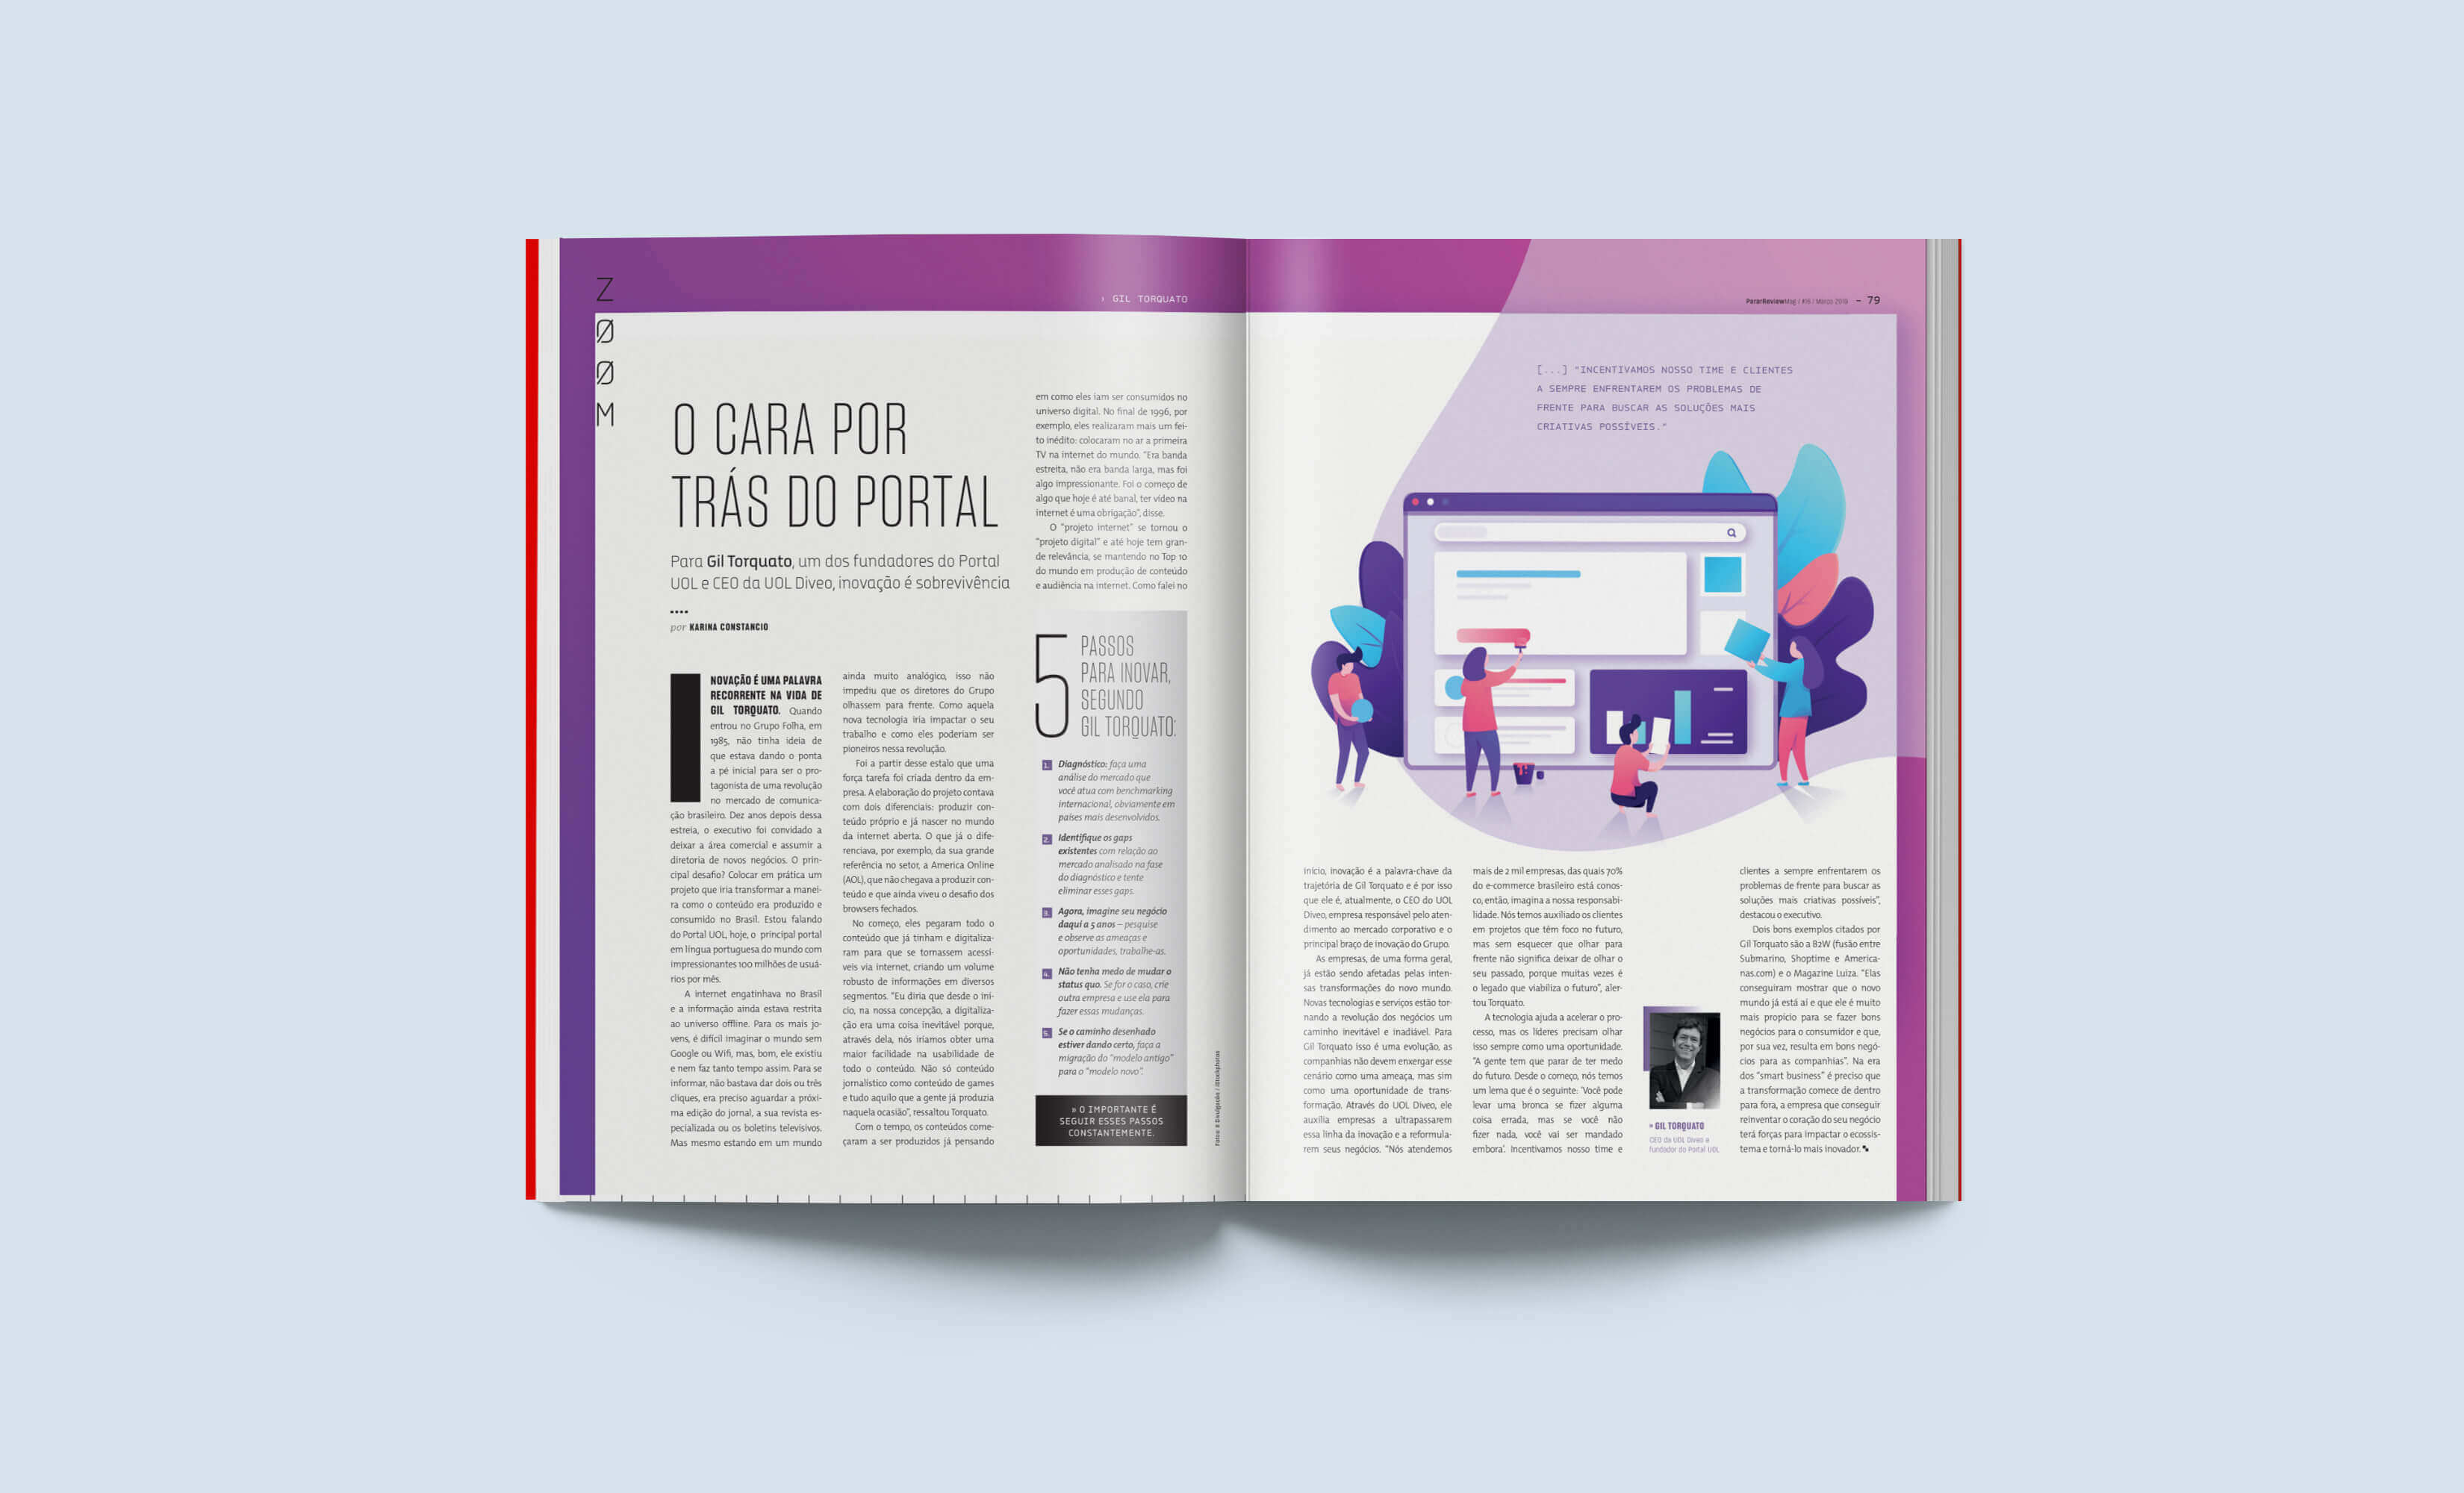 parar-magazine-portal